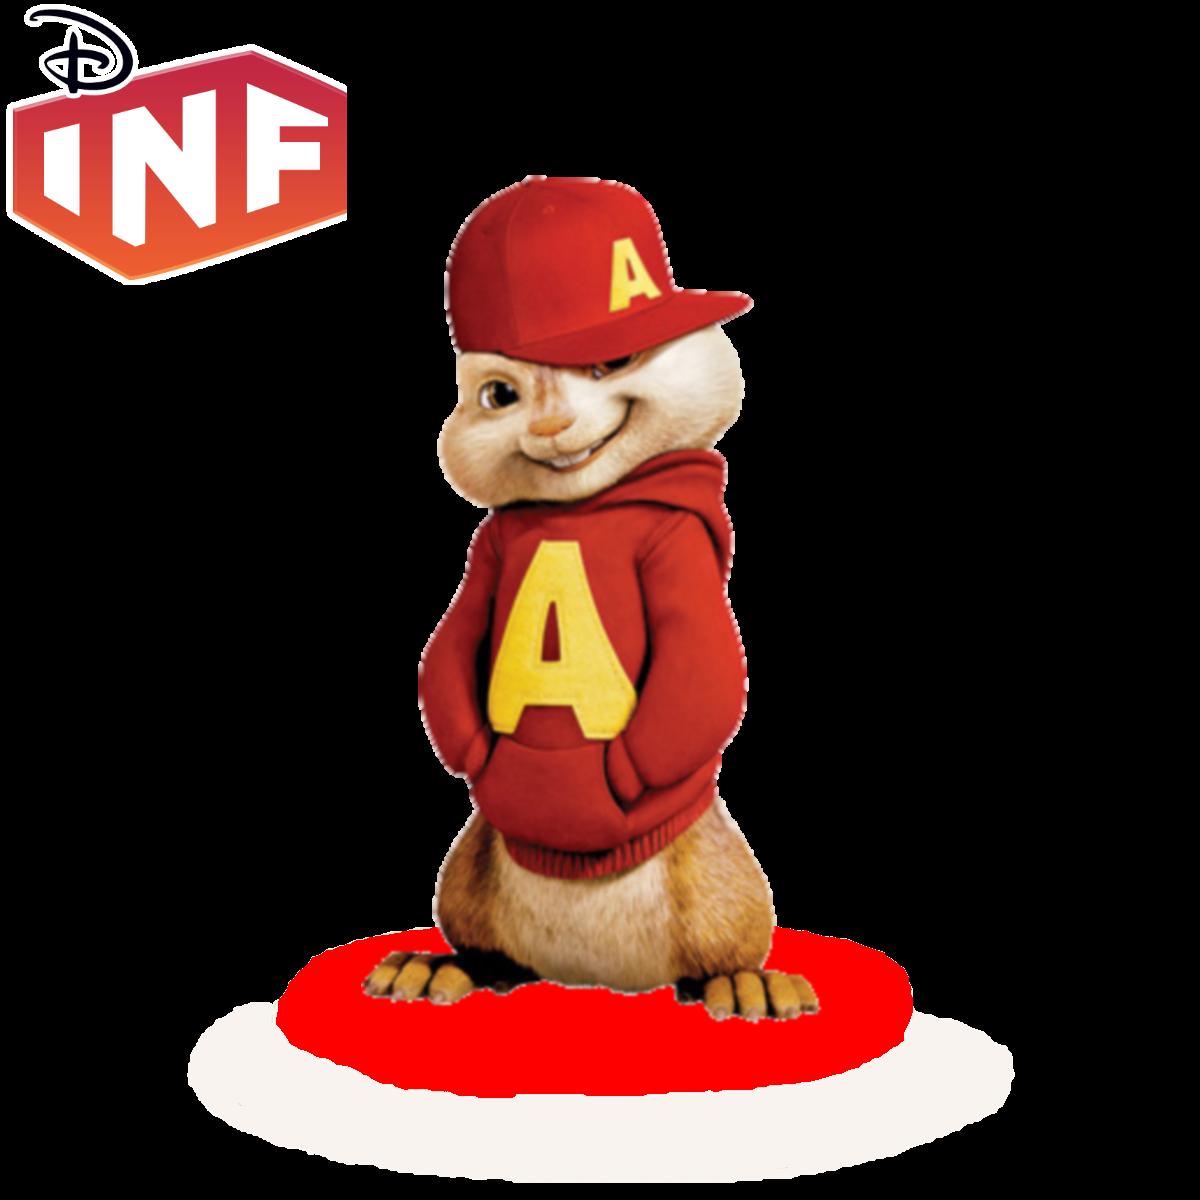 Image Disney Infinity Alvin Png Chipmunk Fanon Wiki